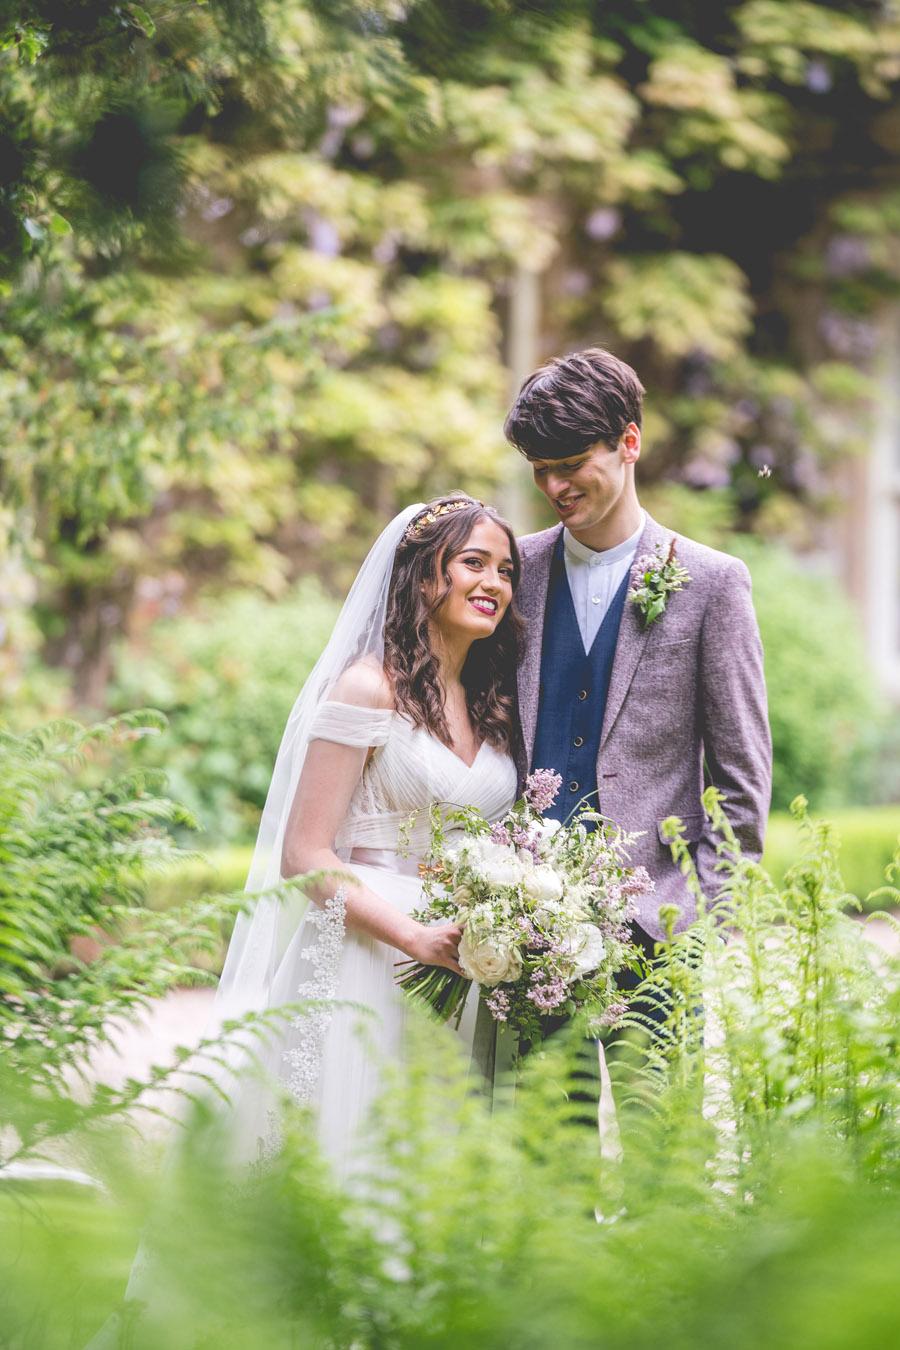 Eshott Hall wedding inspiration, credit Sean Elliott Photography (16)